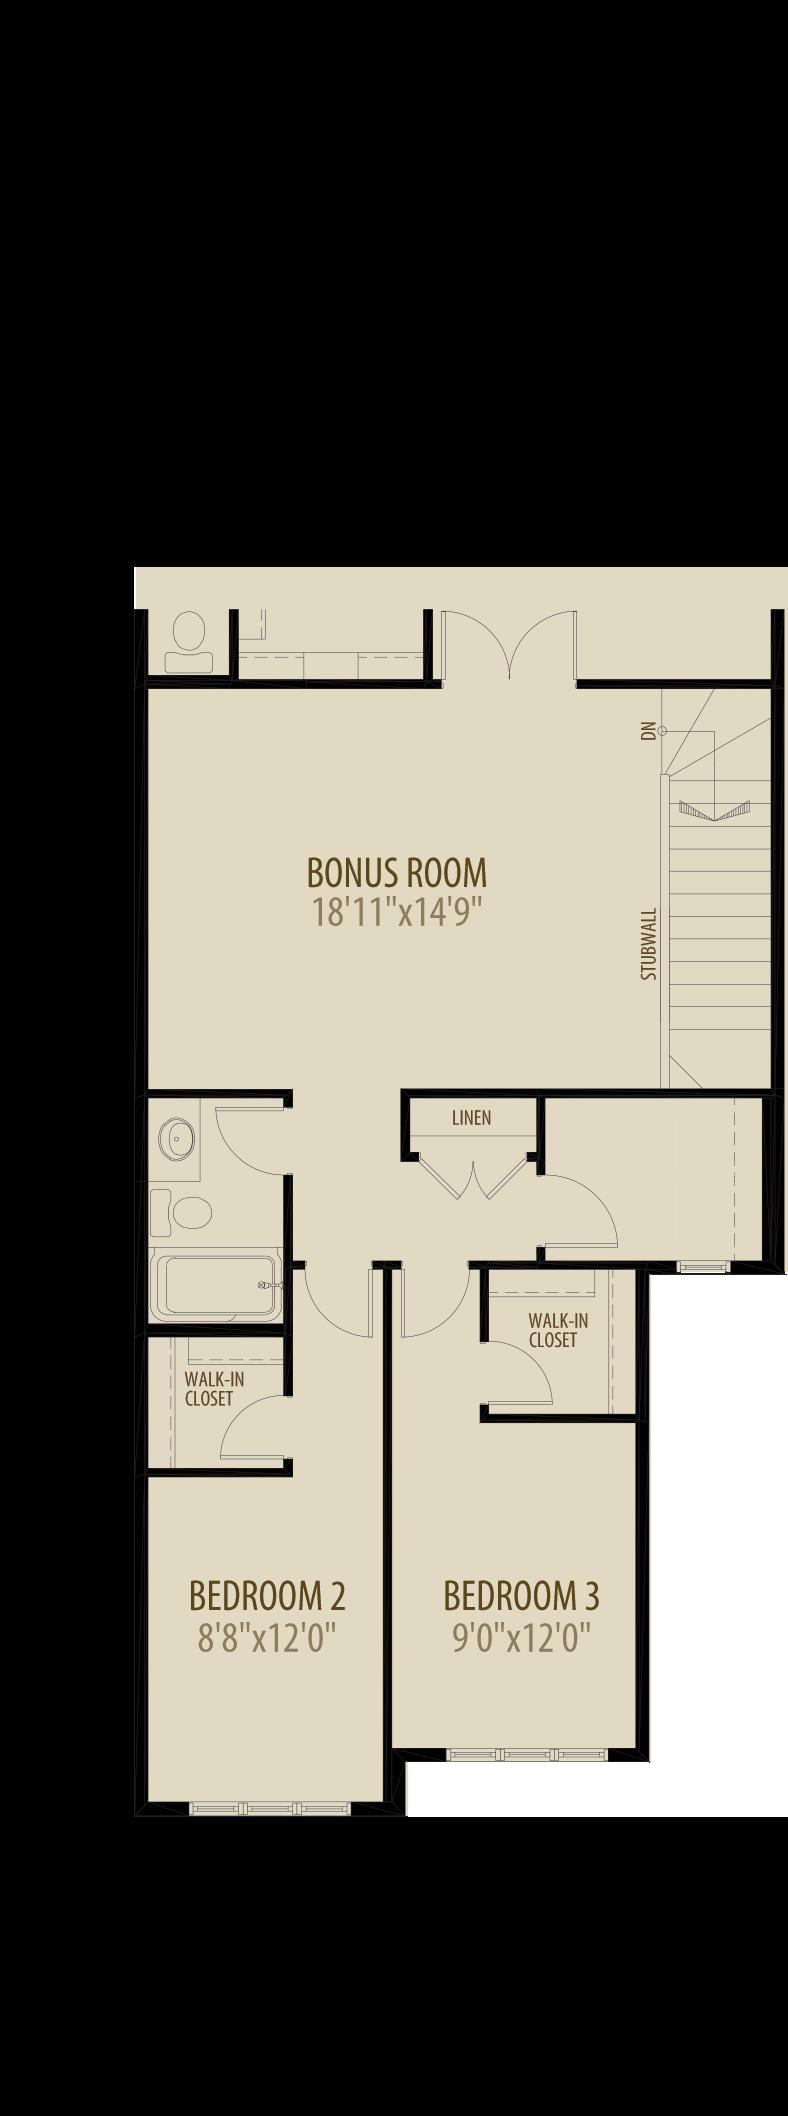 Revised Upper Floor adds 209 sq ft